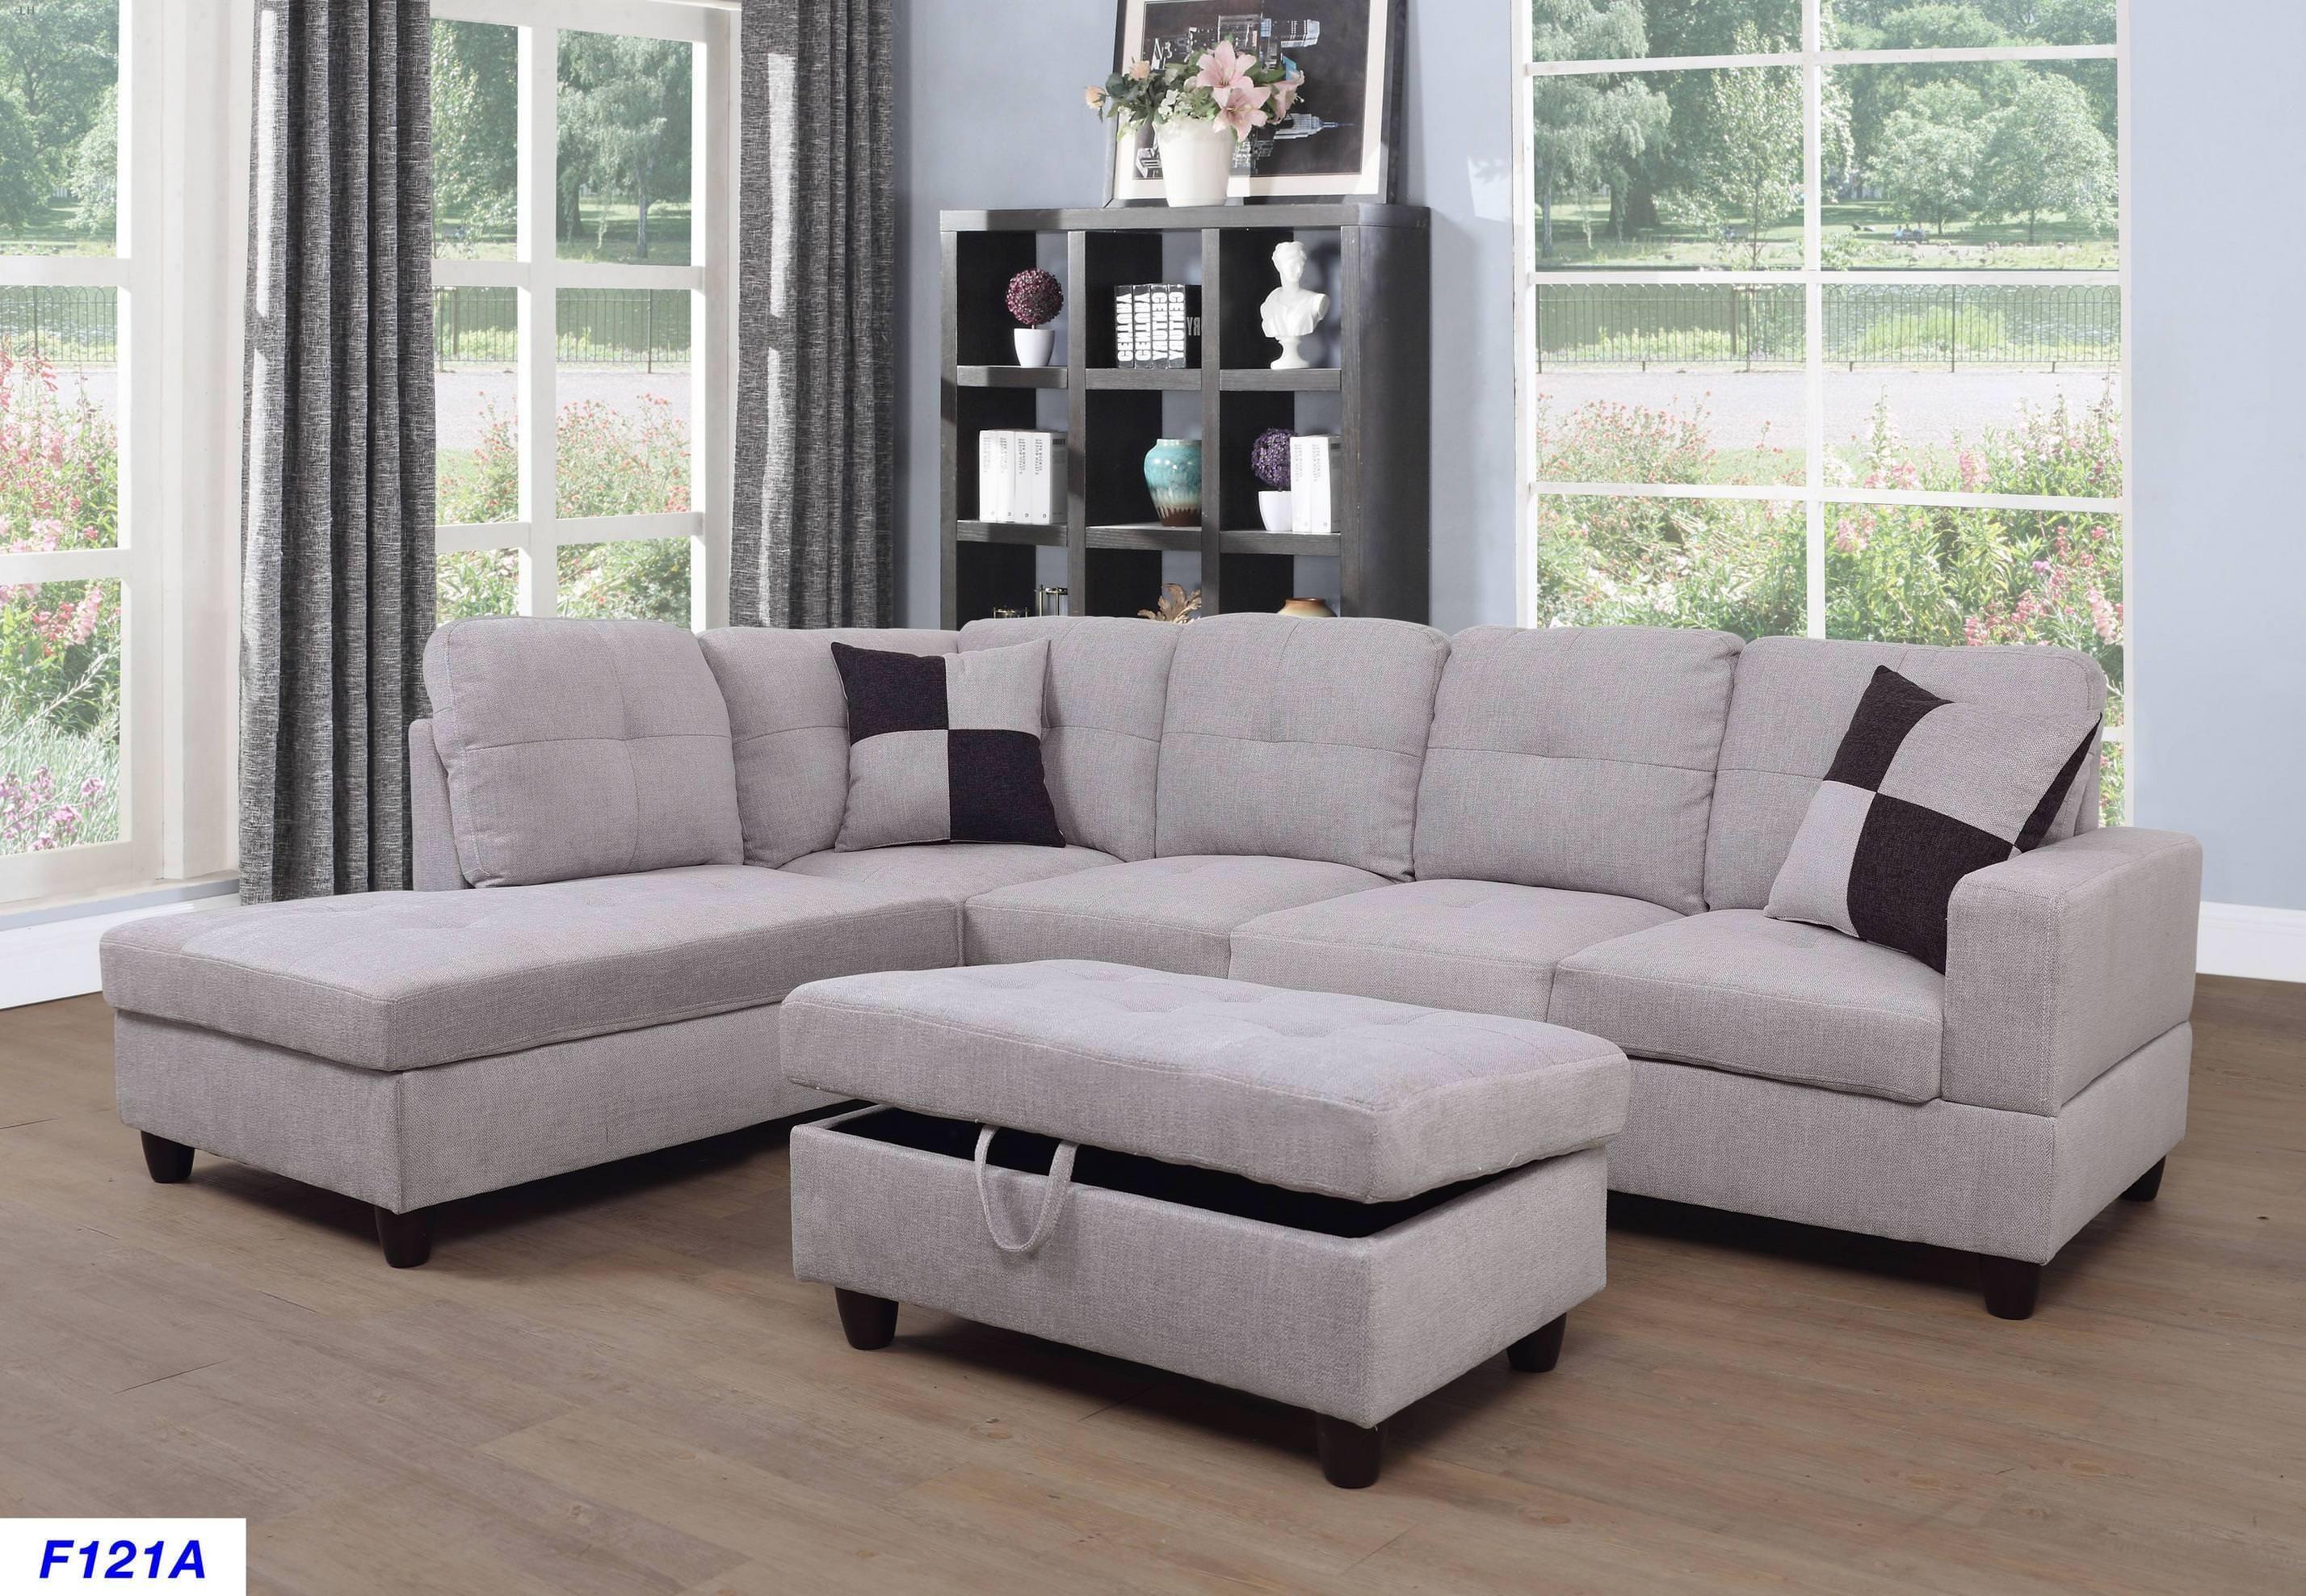 Pin On Sofa Ideas